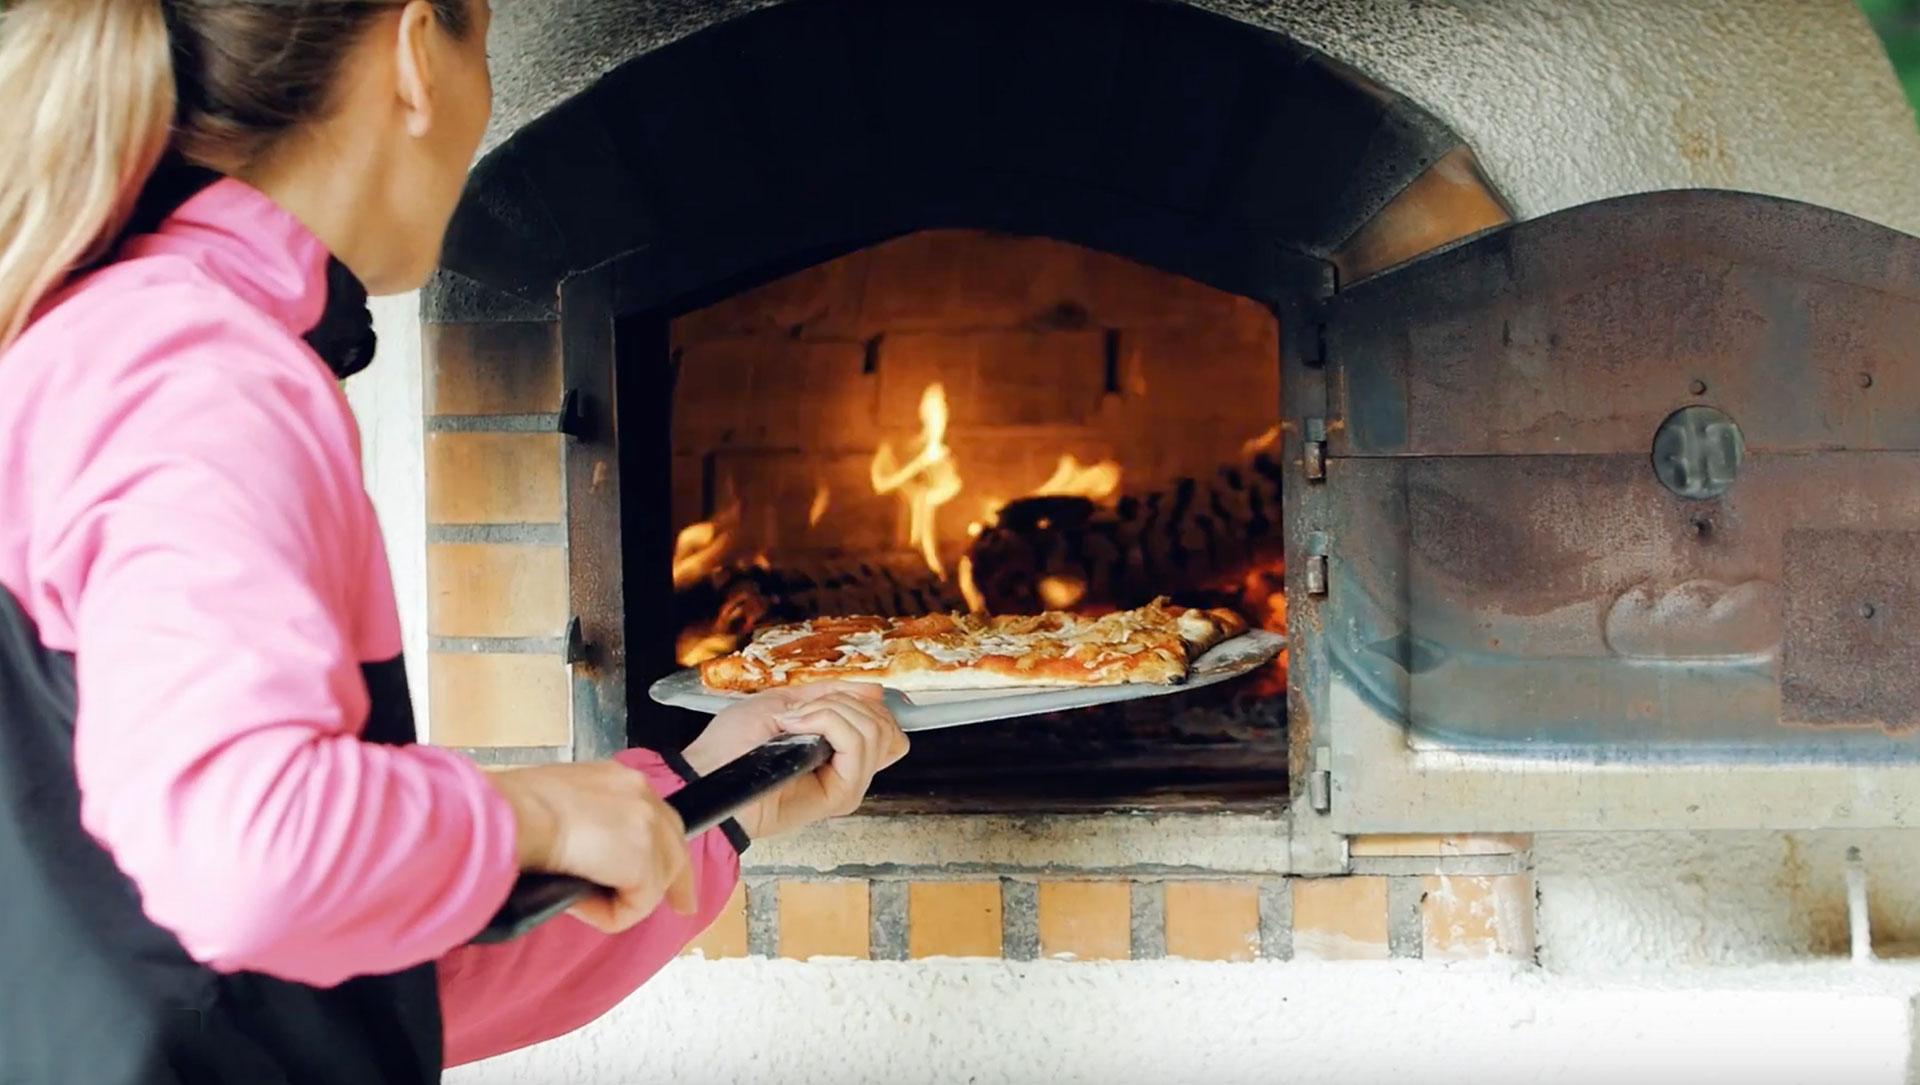 RSA-video-pizza-ovn